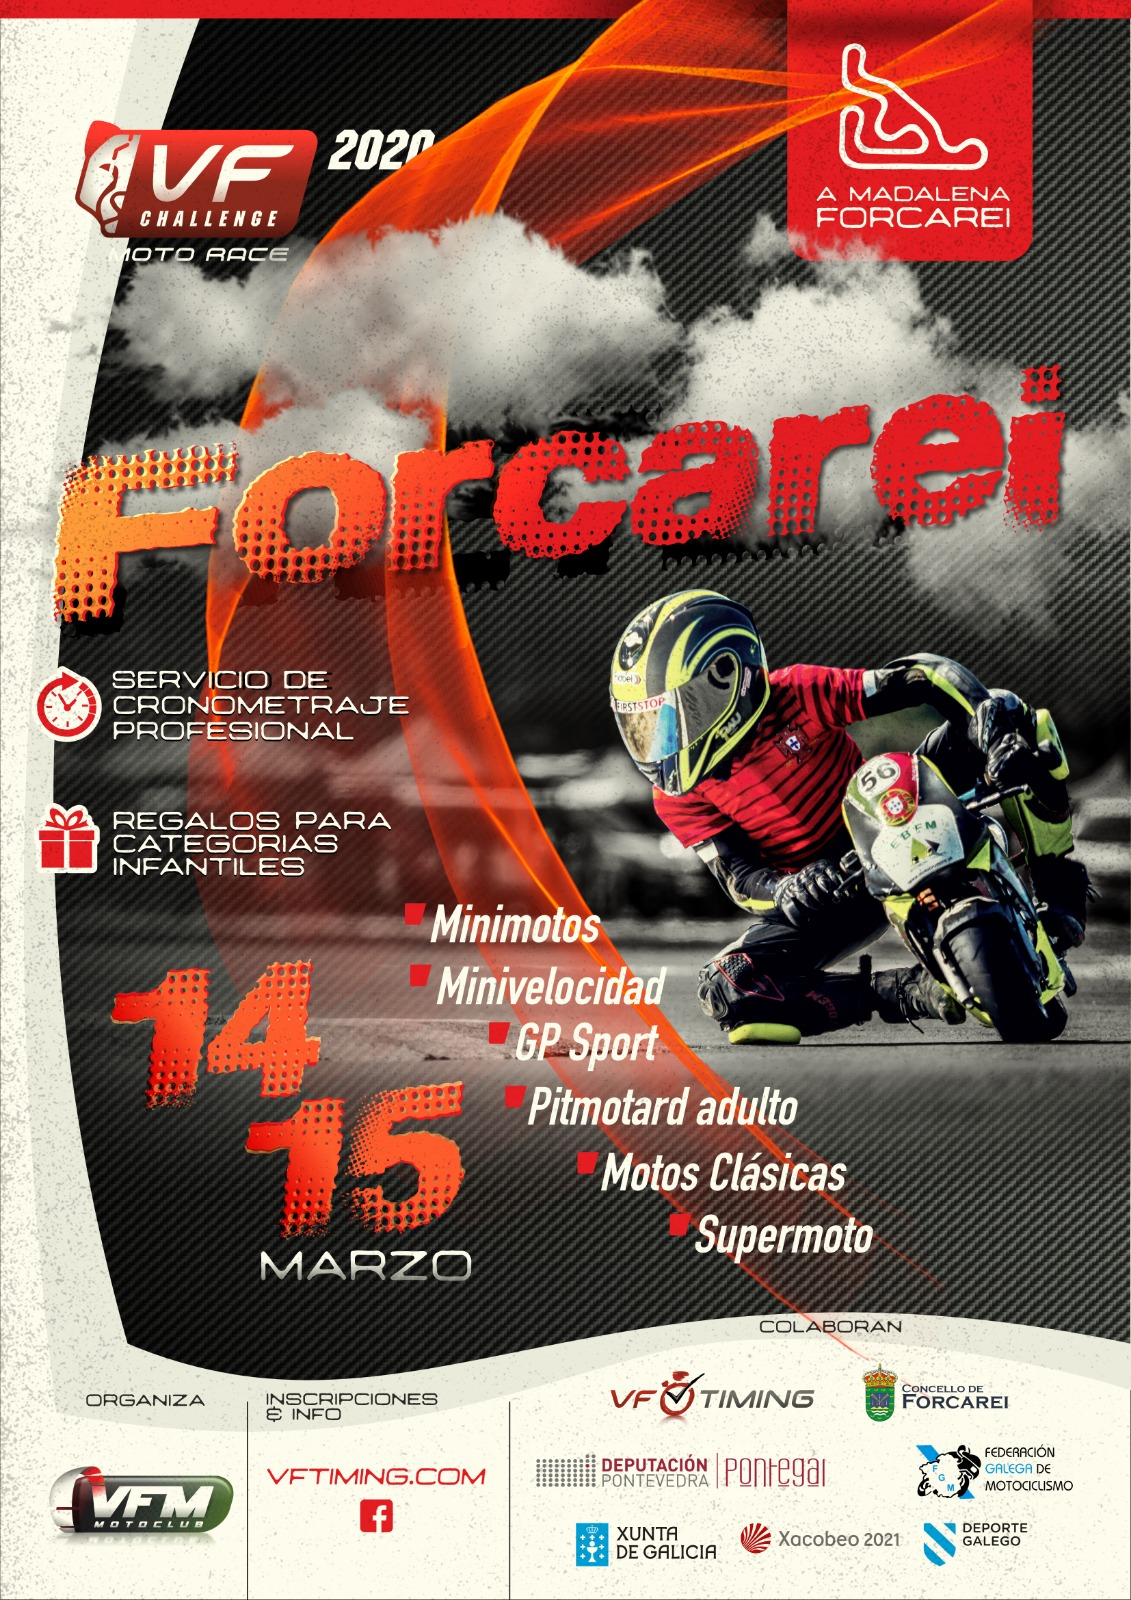 VF Challenge Moto Race Forcarei I